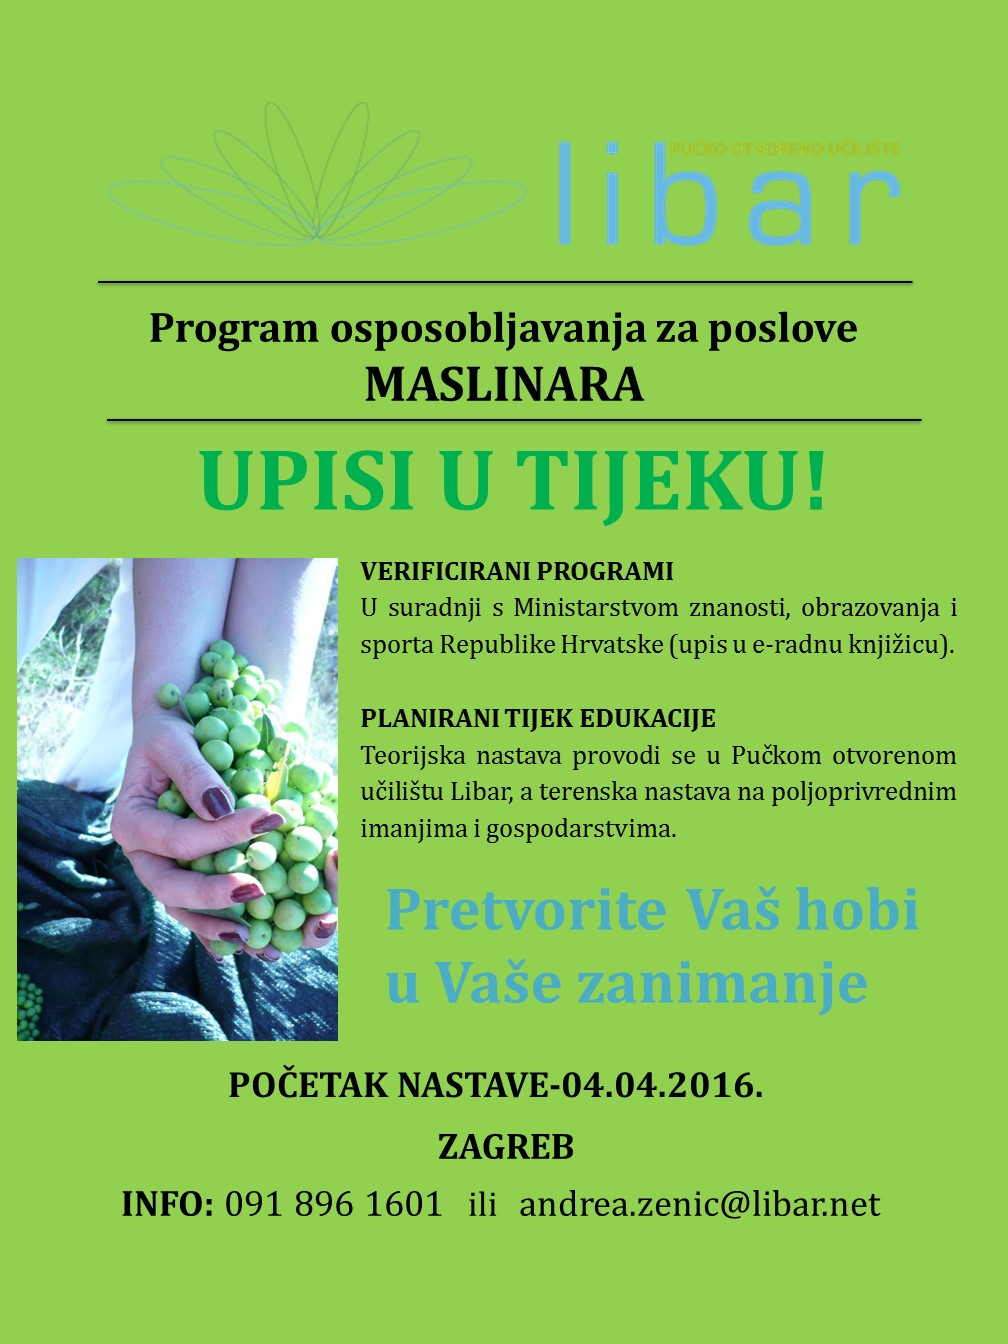 PROGRAM OSPOSOBLJAVANJA - MASLINAR/KA